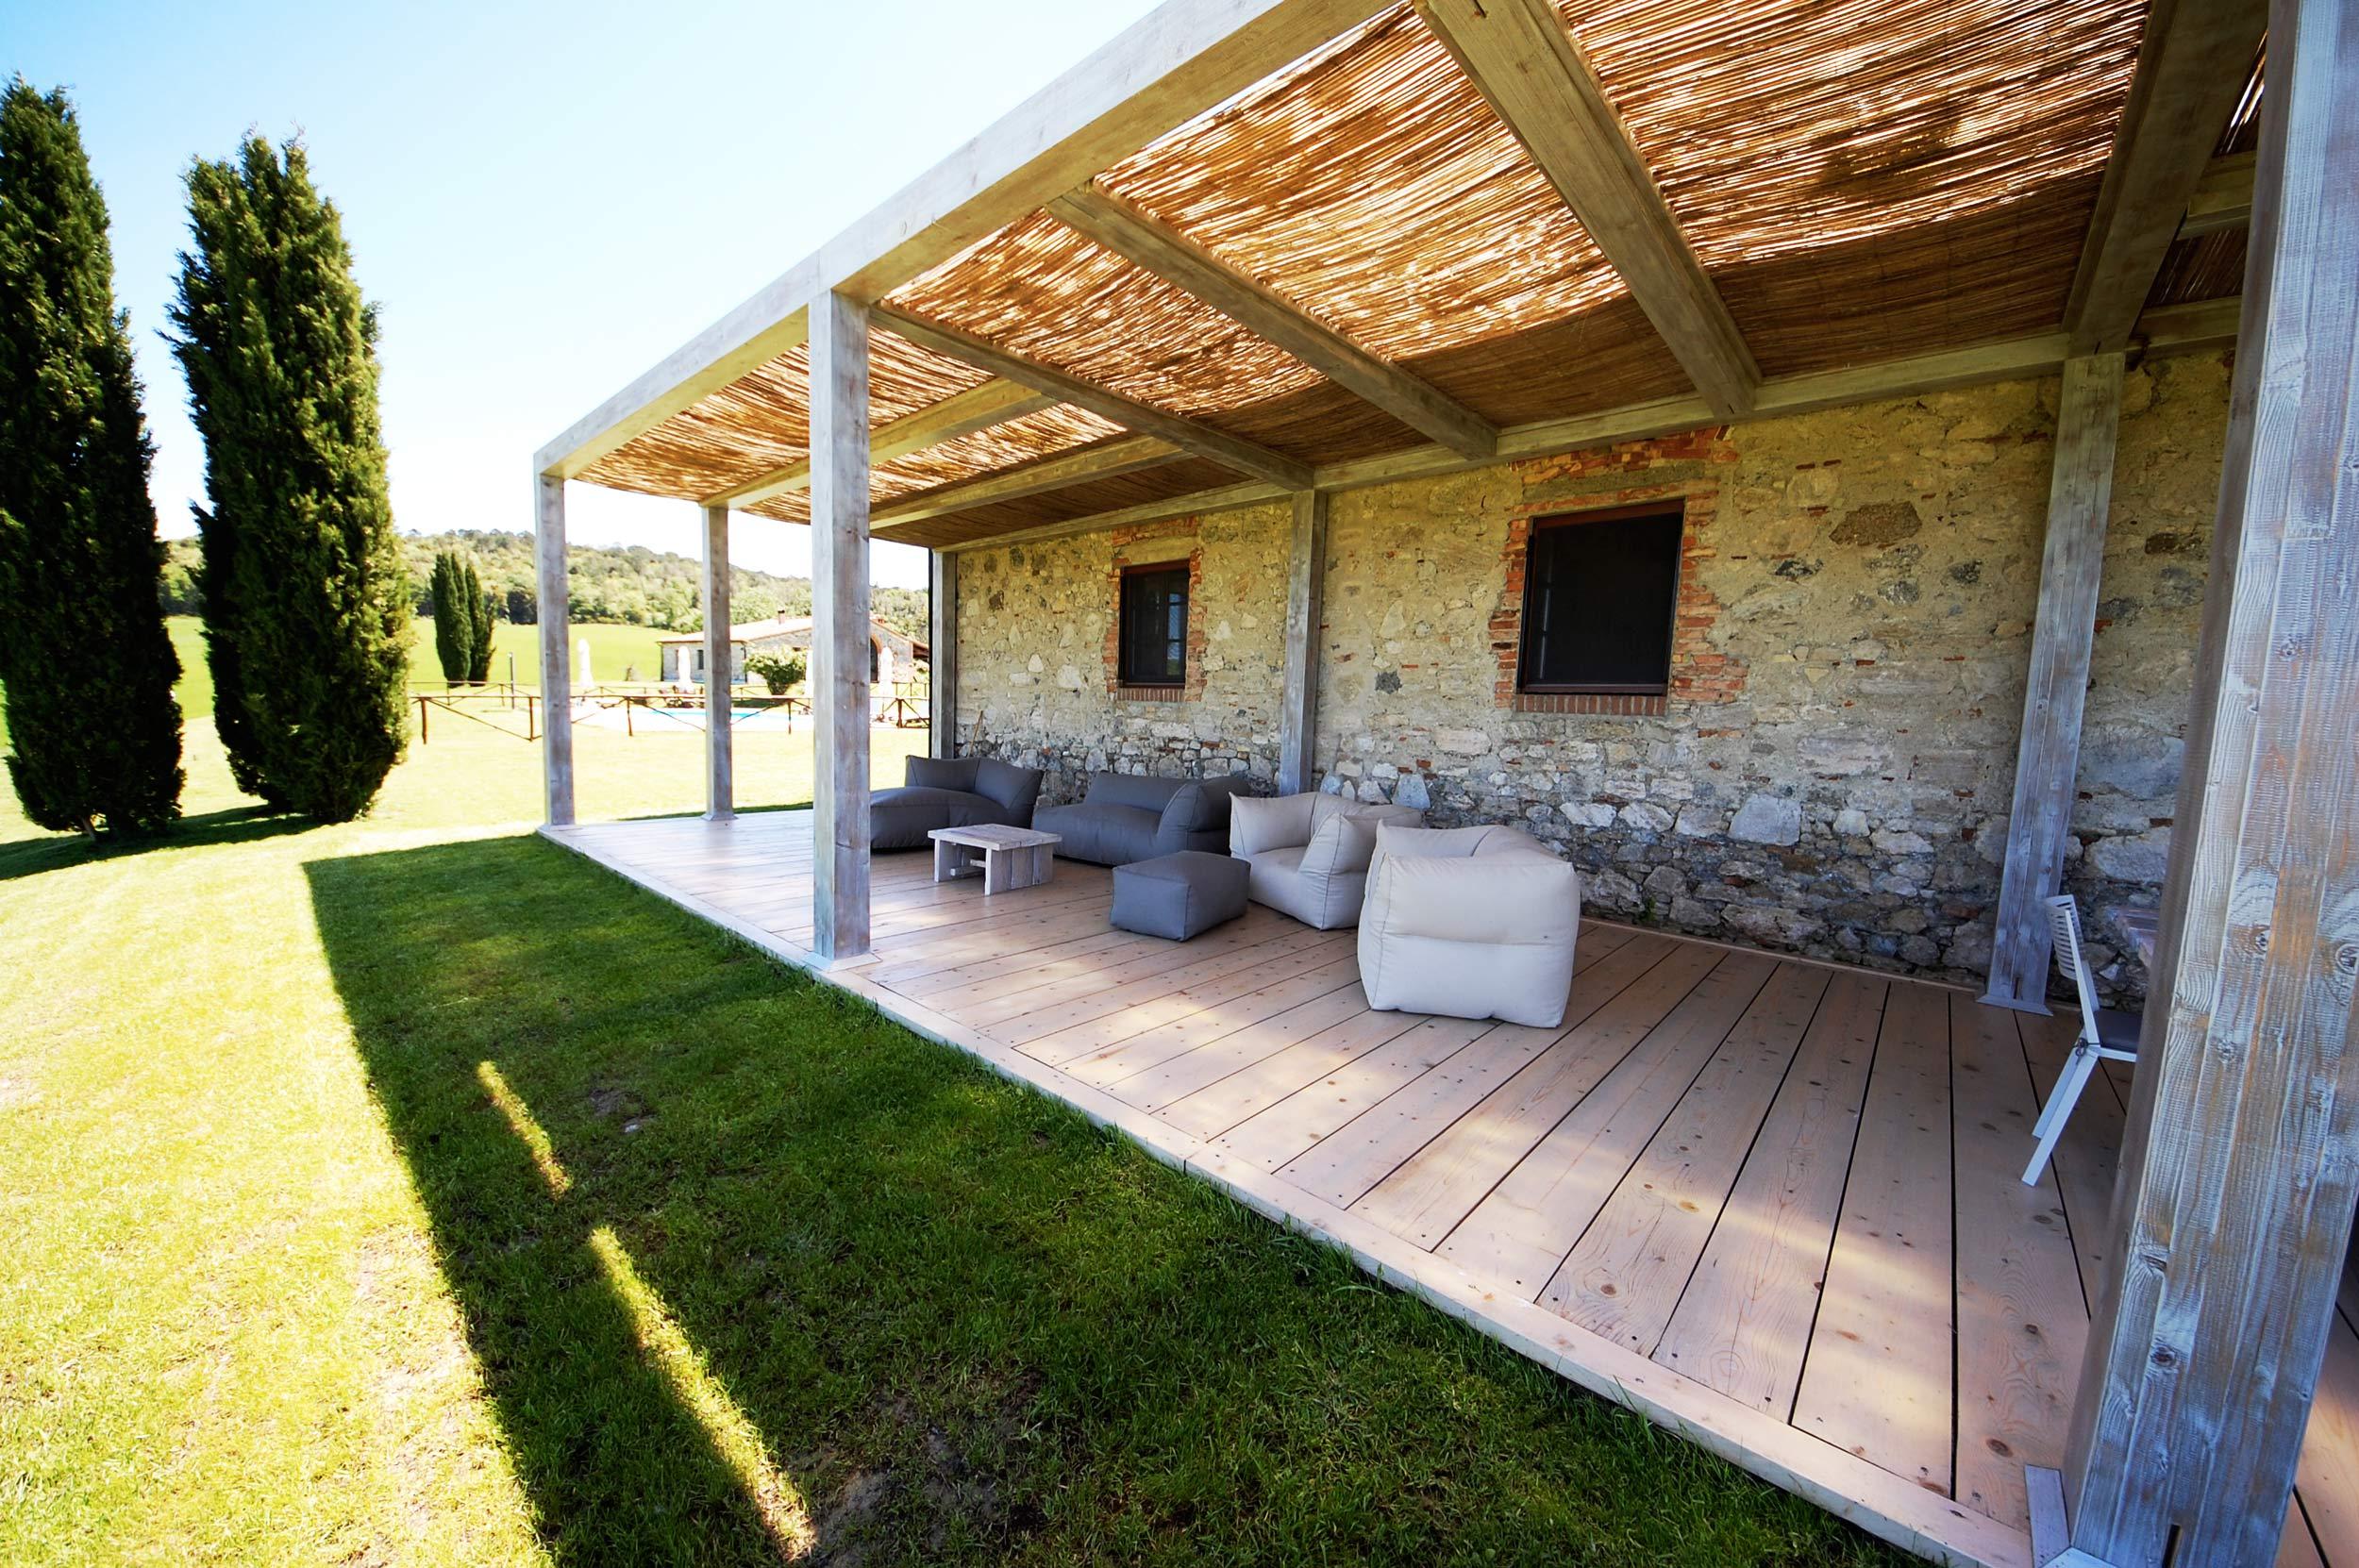 Pergolato casale in Toscanas